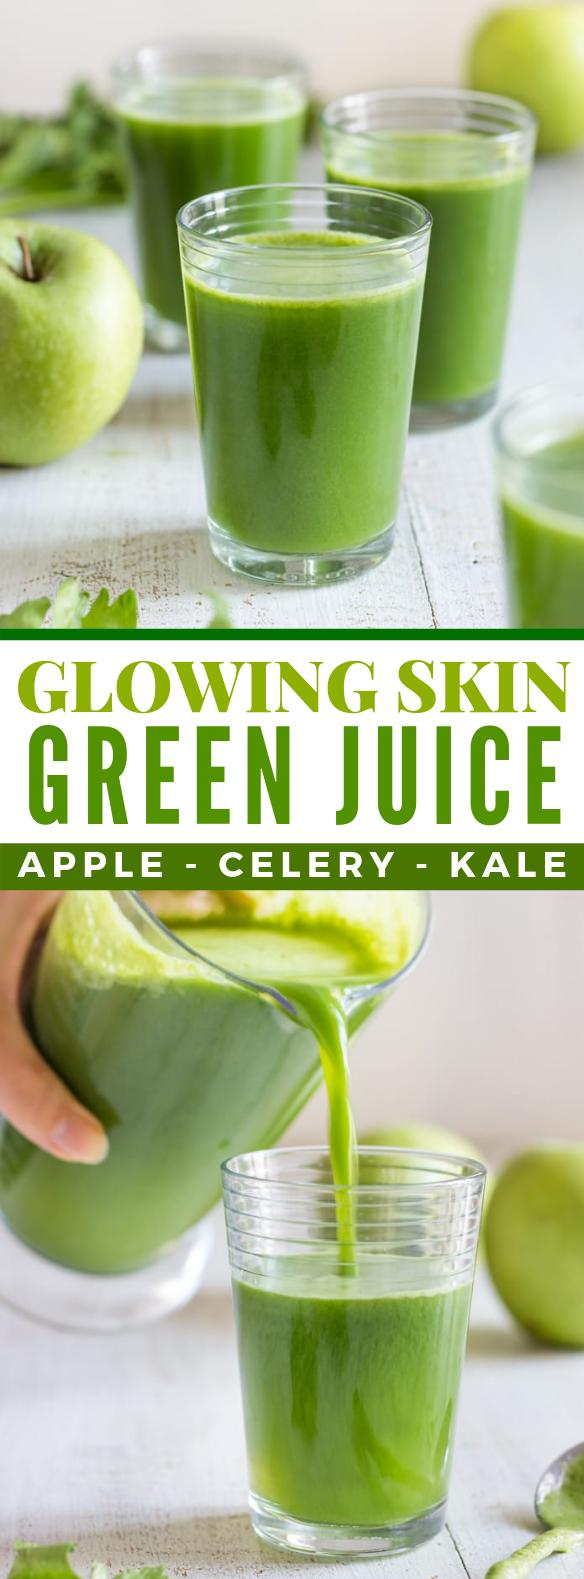 GLOWING SKIN GREEN JUICE #drinks #juicer